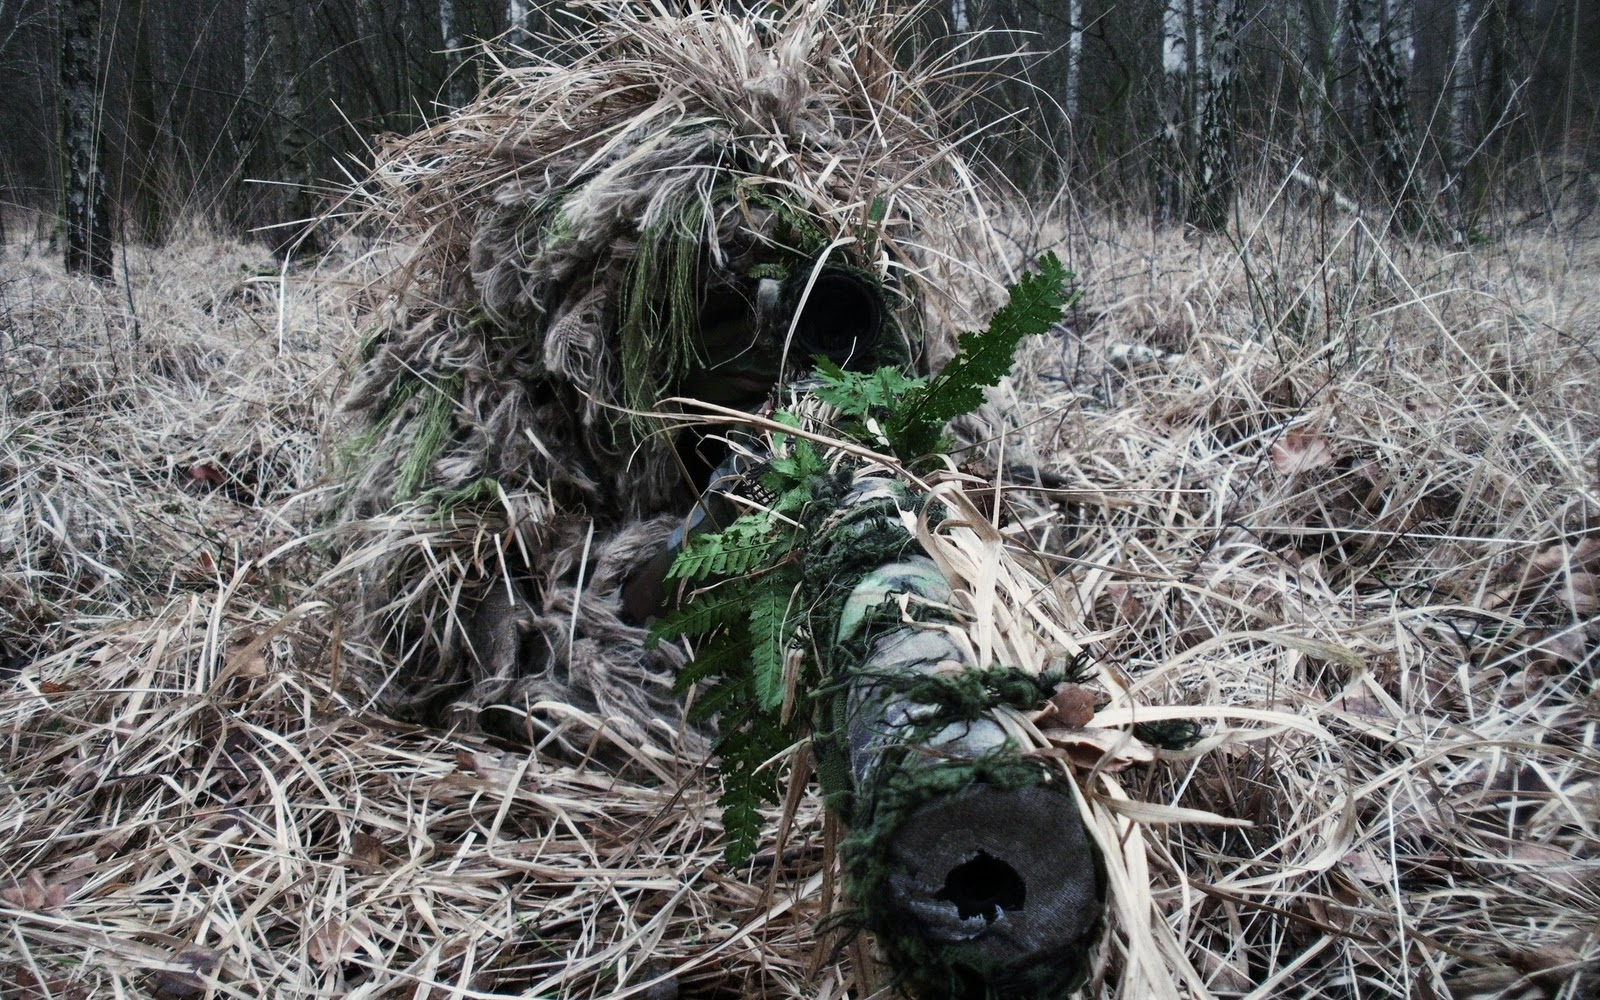 Sniper Ghillie Camo Suit Camouflage HD Wallpapers Epic Desktop 1600x1000